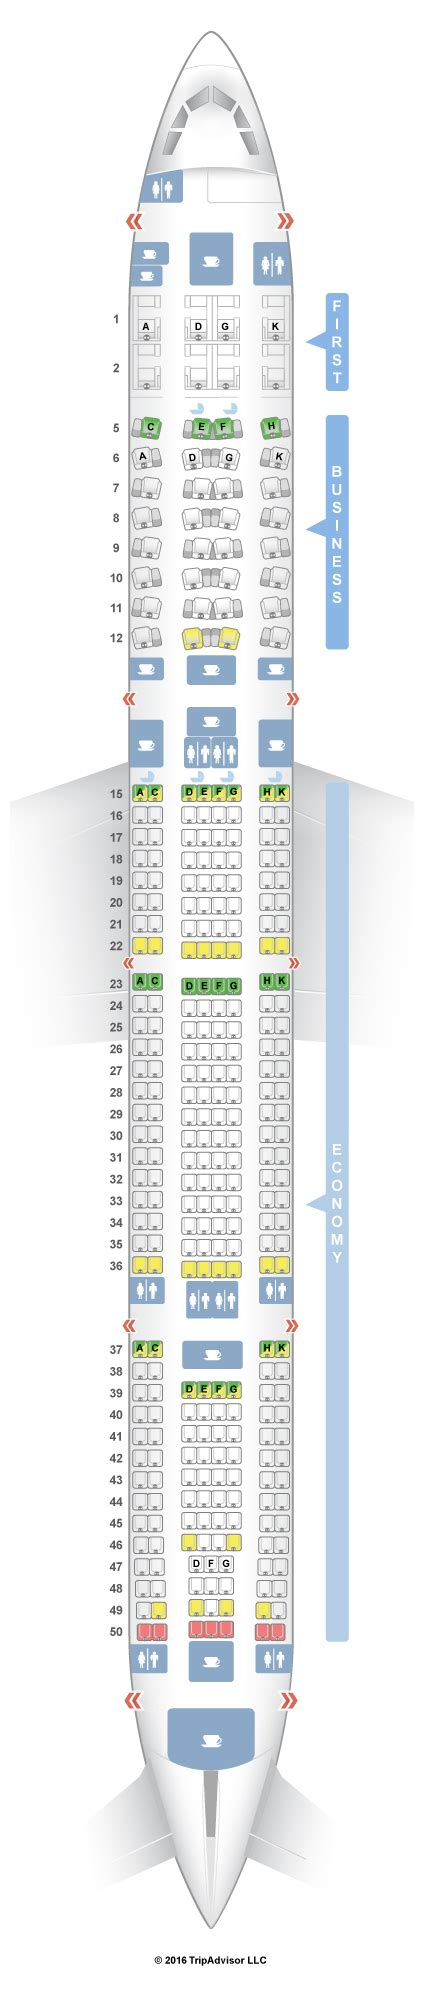 etihad airways seat map seatguru seat map etihad airbus a340 600 346